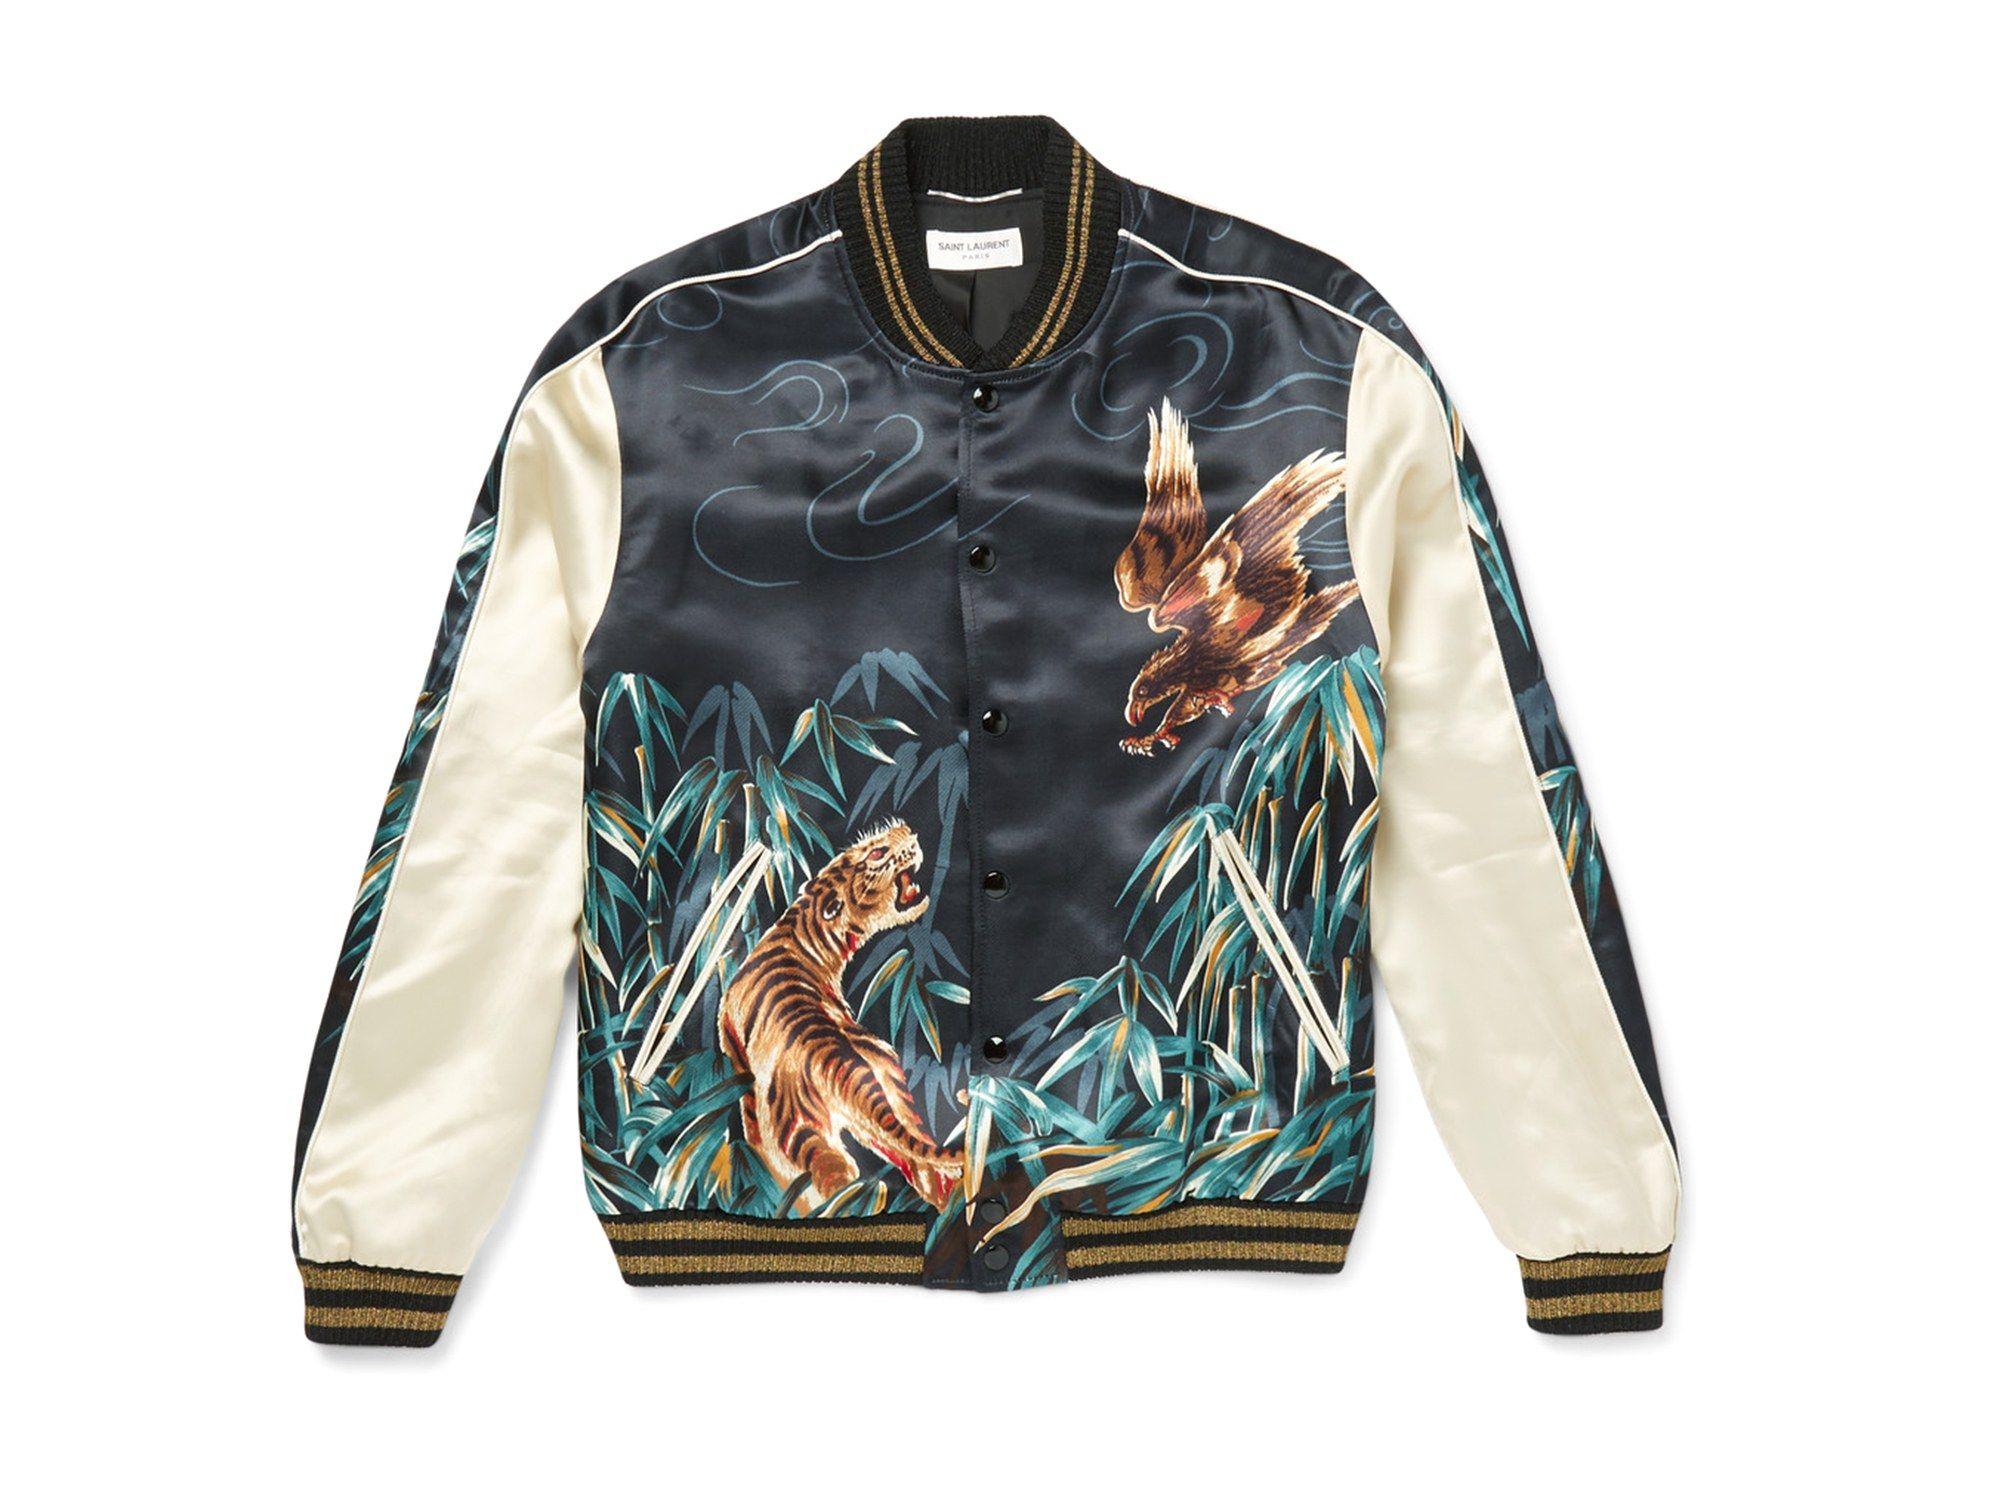 How To Reach Gosling Level Style With One Jacket Mens Designer Coats Varsity Jacket Mens Jackets [ 1500 x 2000 Pixel ]